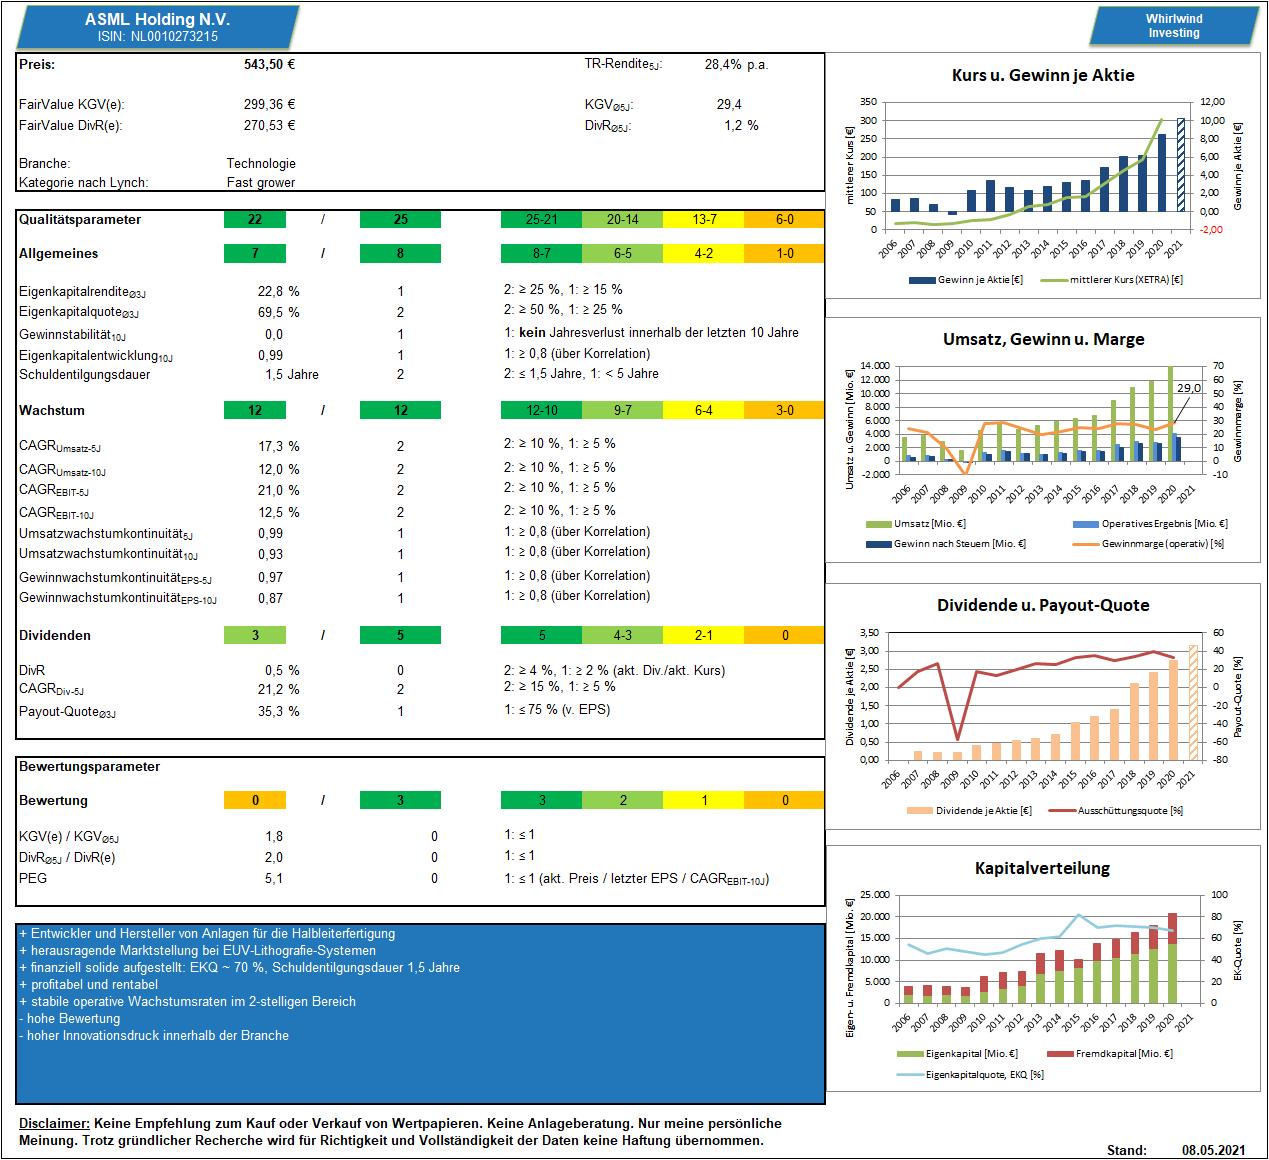 ASML - Dashboard, Whirlwind-Investing